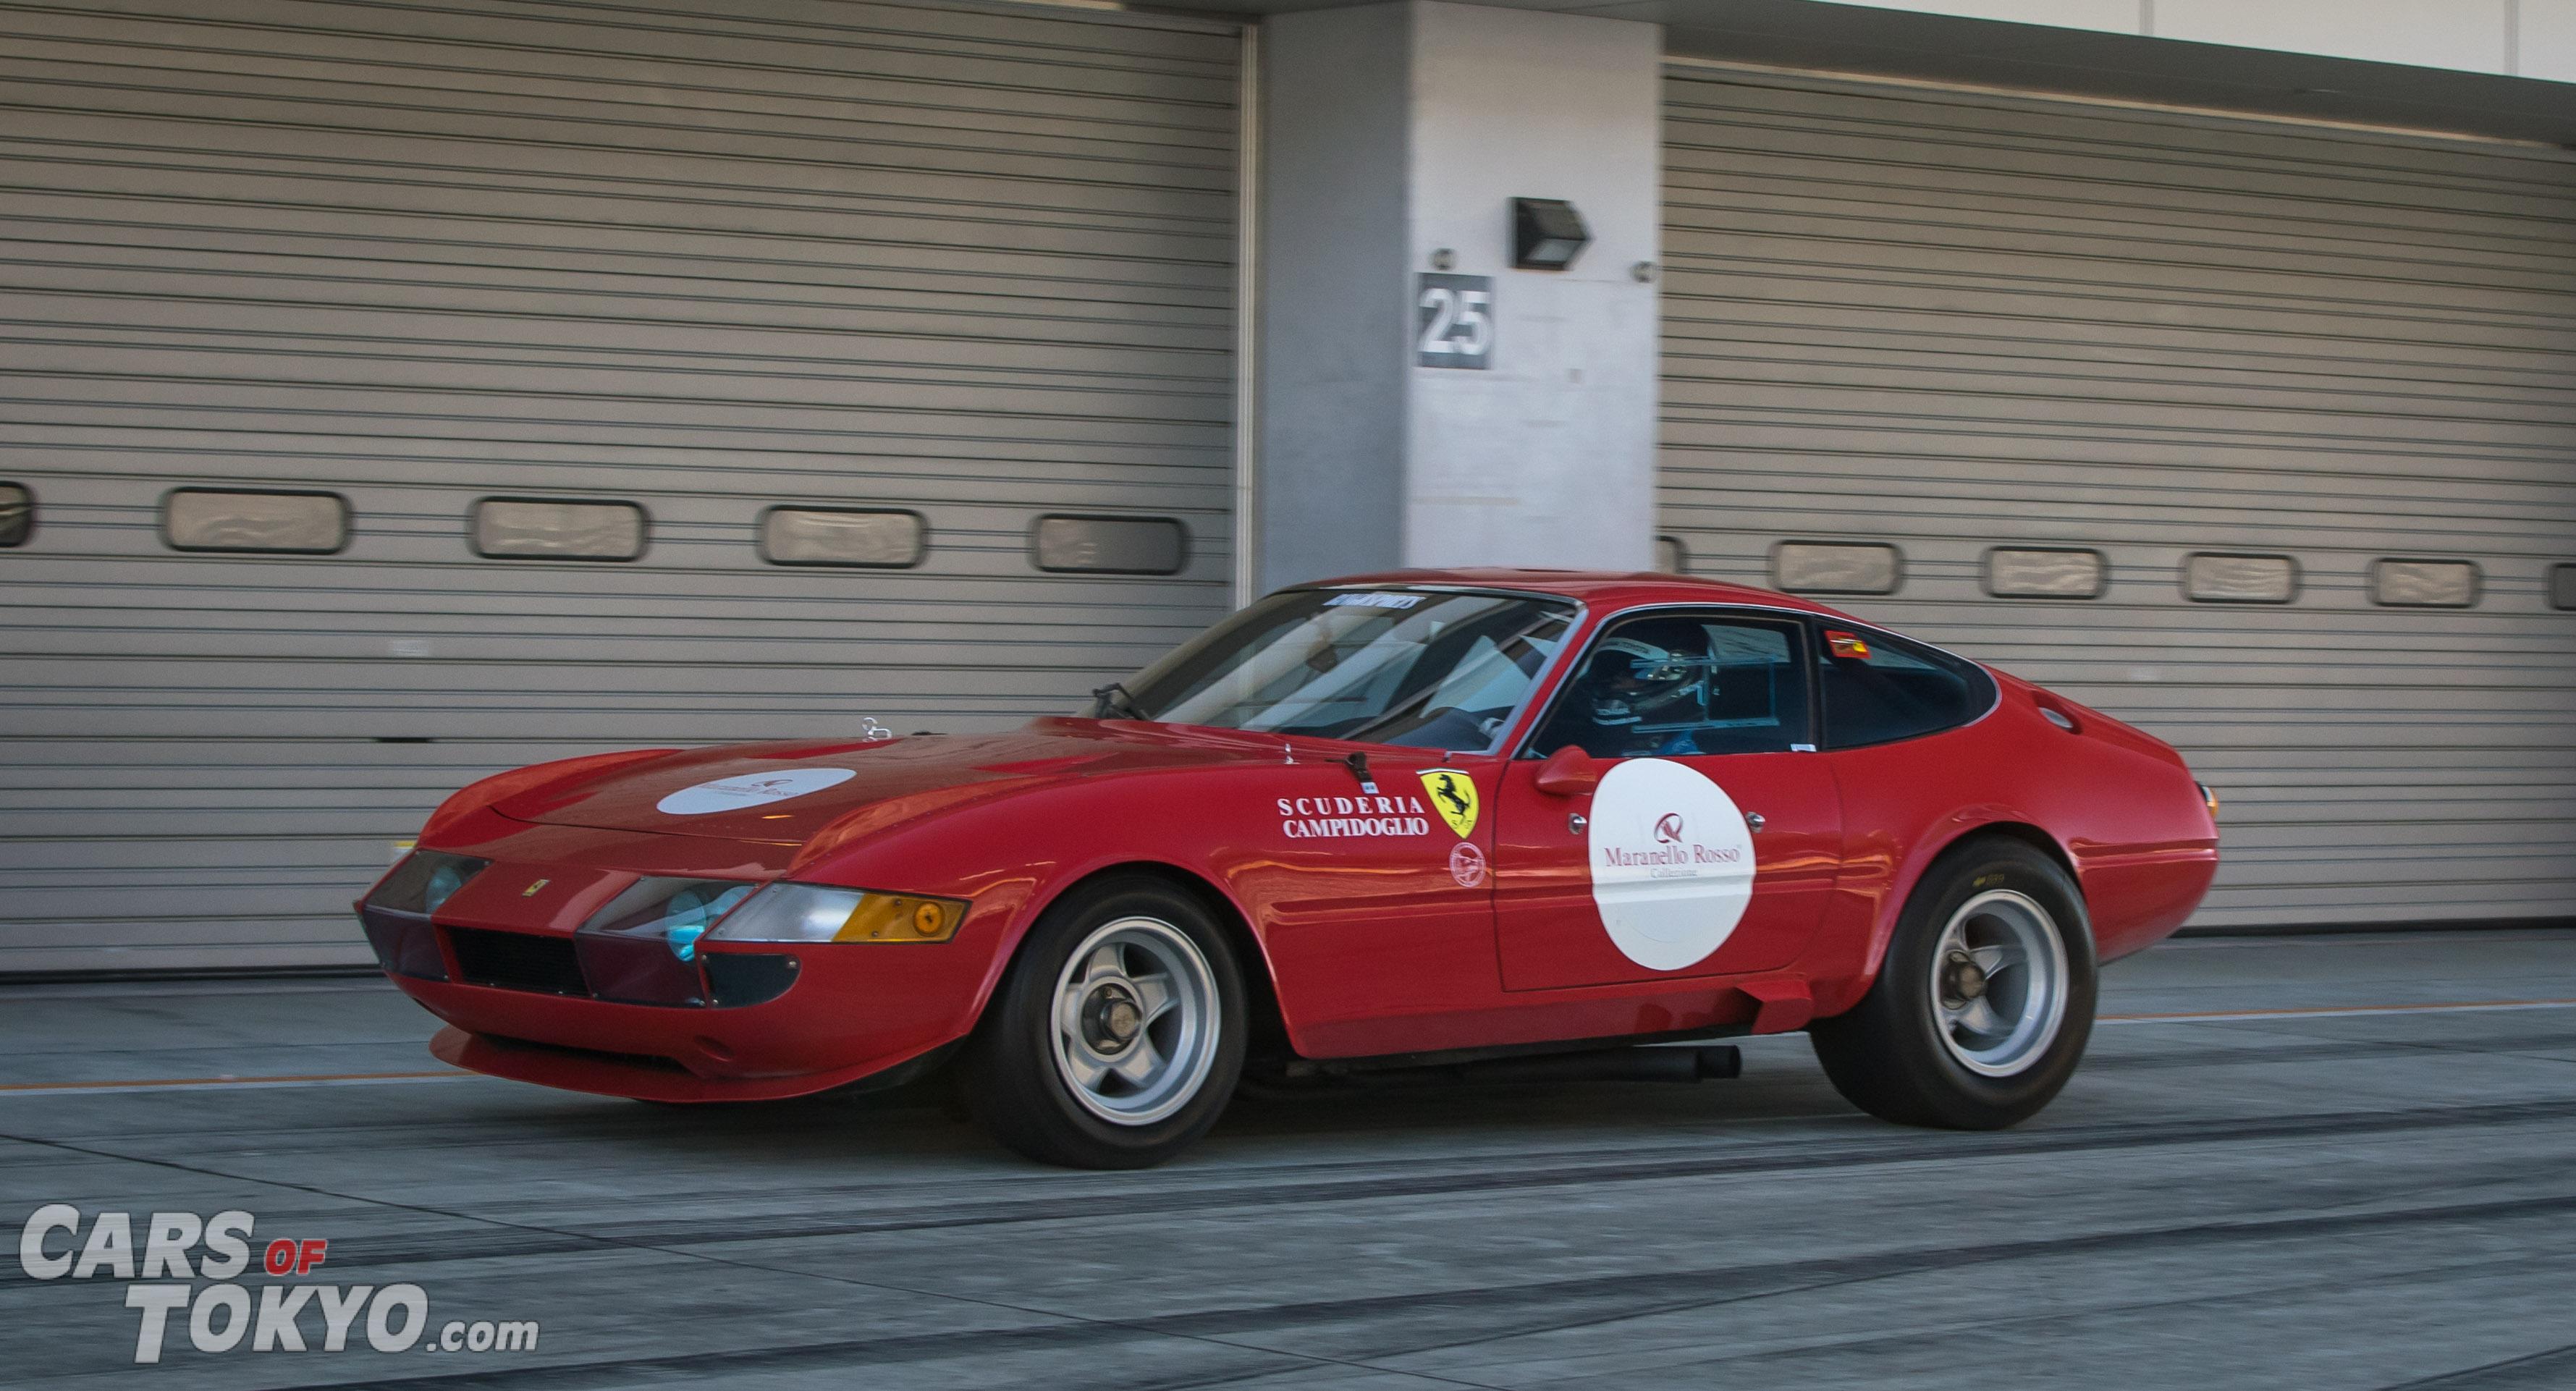 Cars of Tokyo Classic Ferrari 365 Daytona Competizione